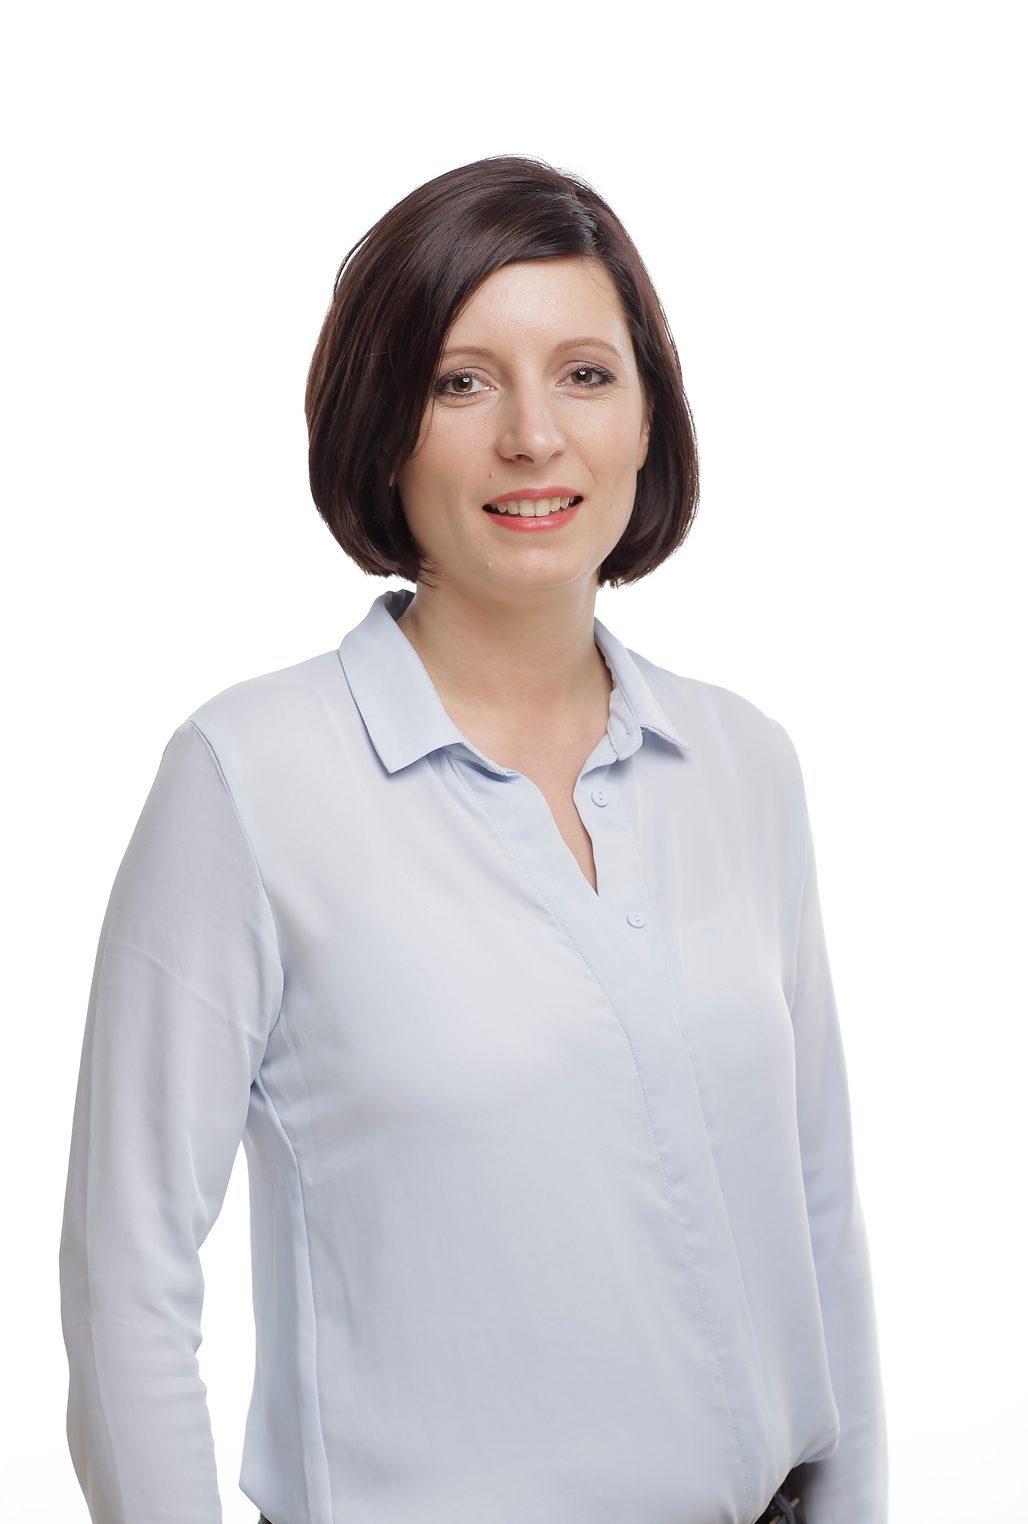 Linda De Bries klantenservice